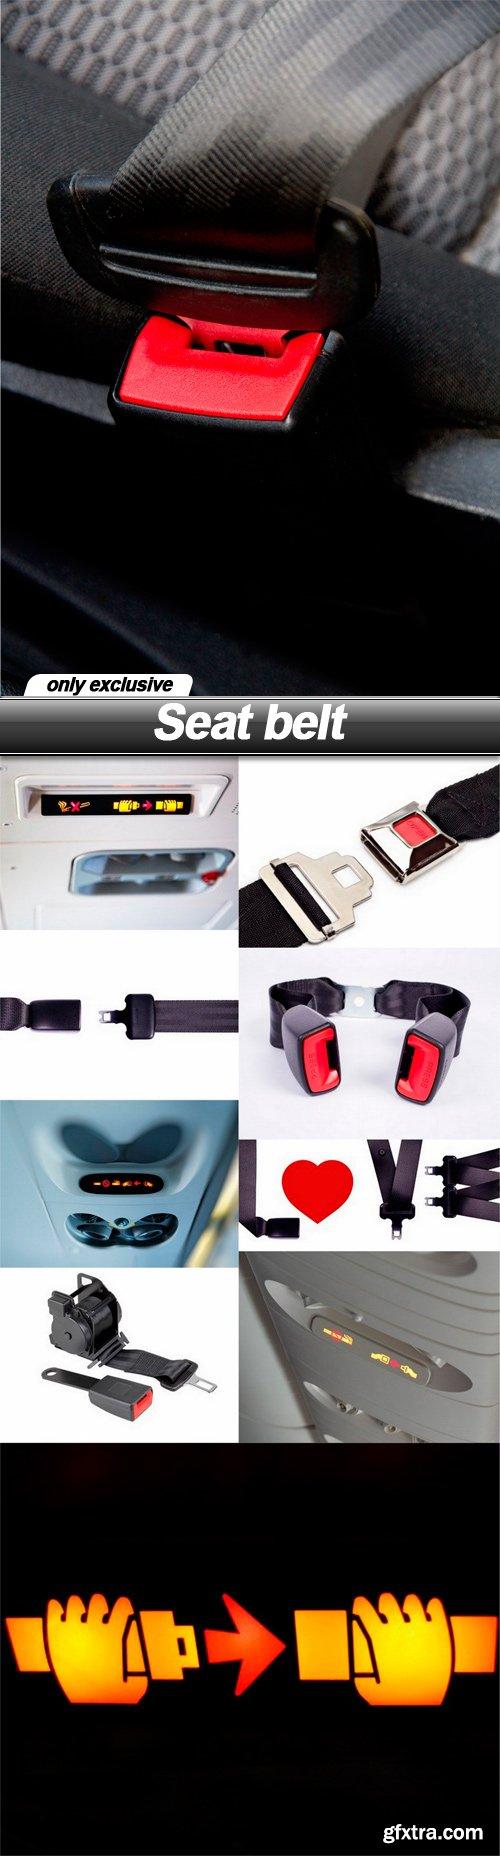 Seat belt - 10 UHQ JPEG